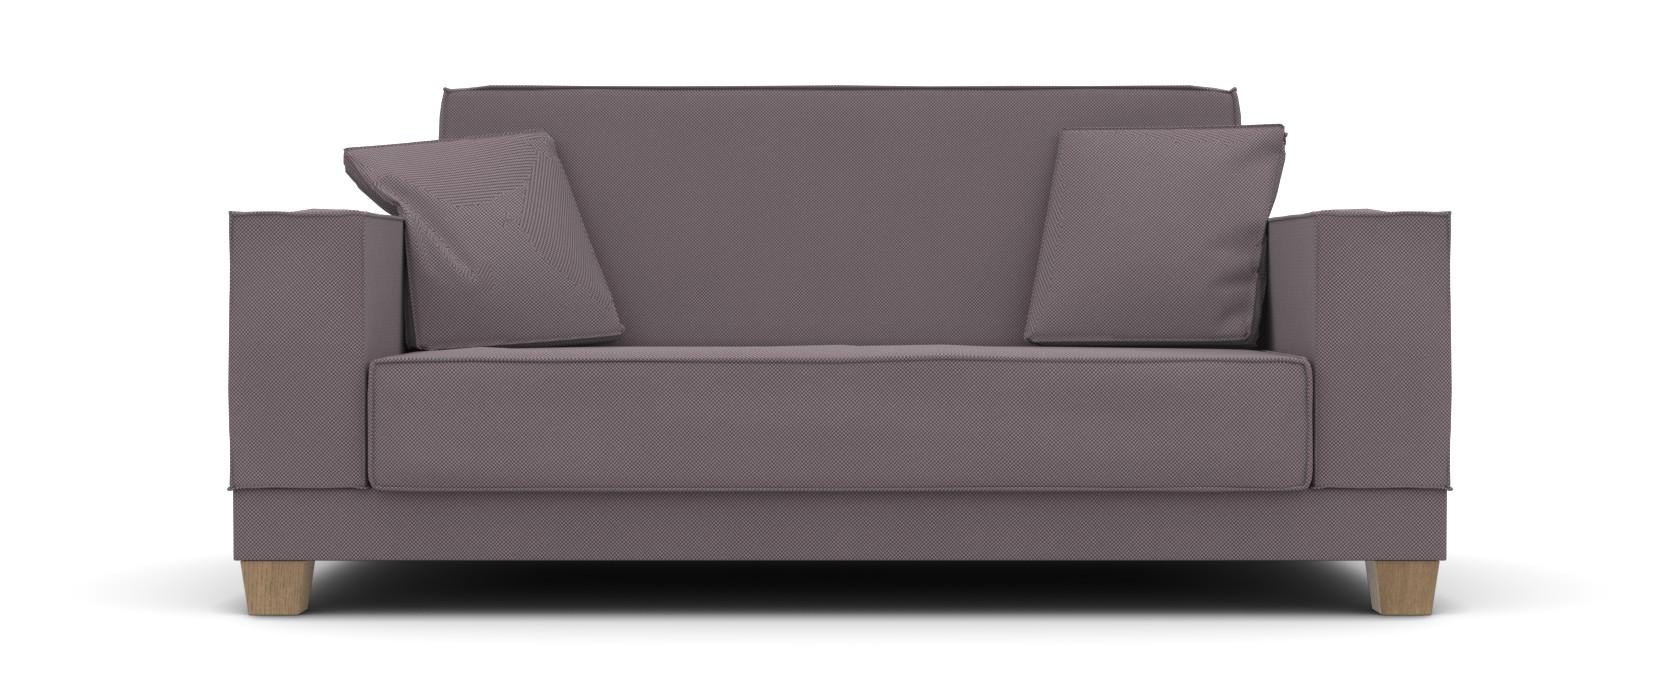 Двухместный диван Cosima - Pufetto